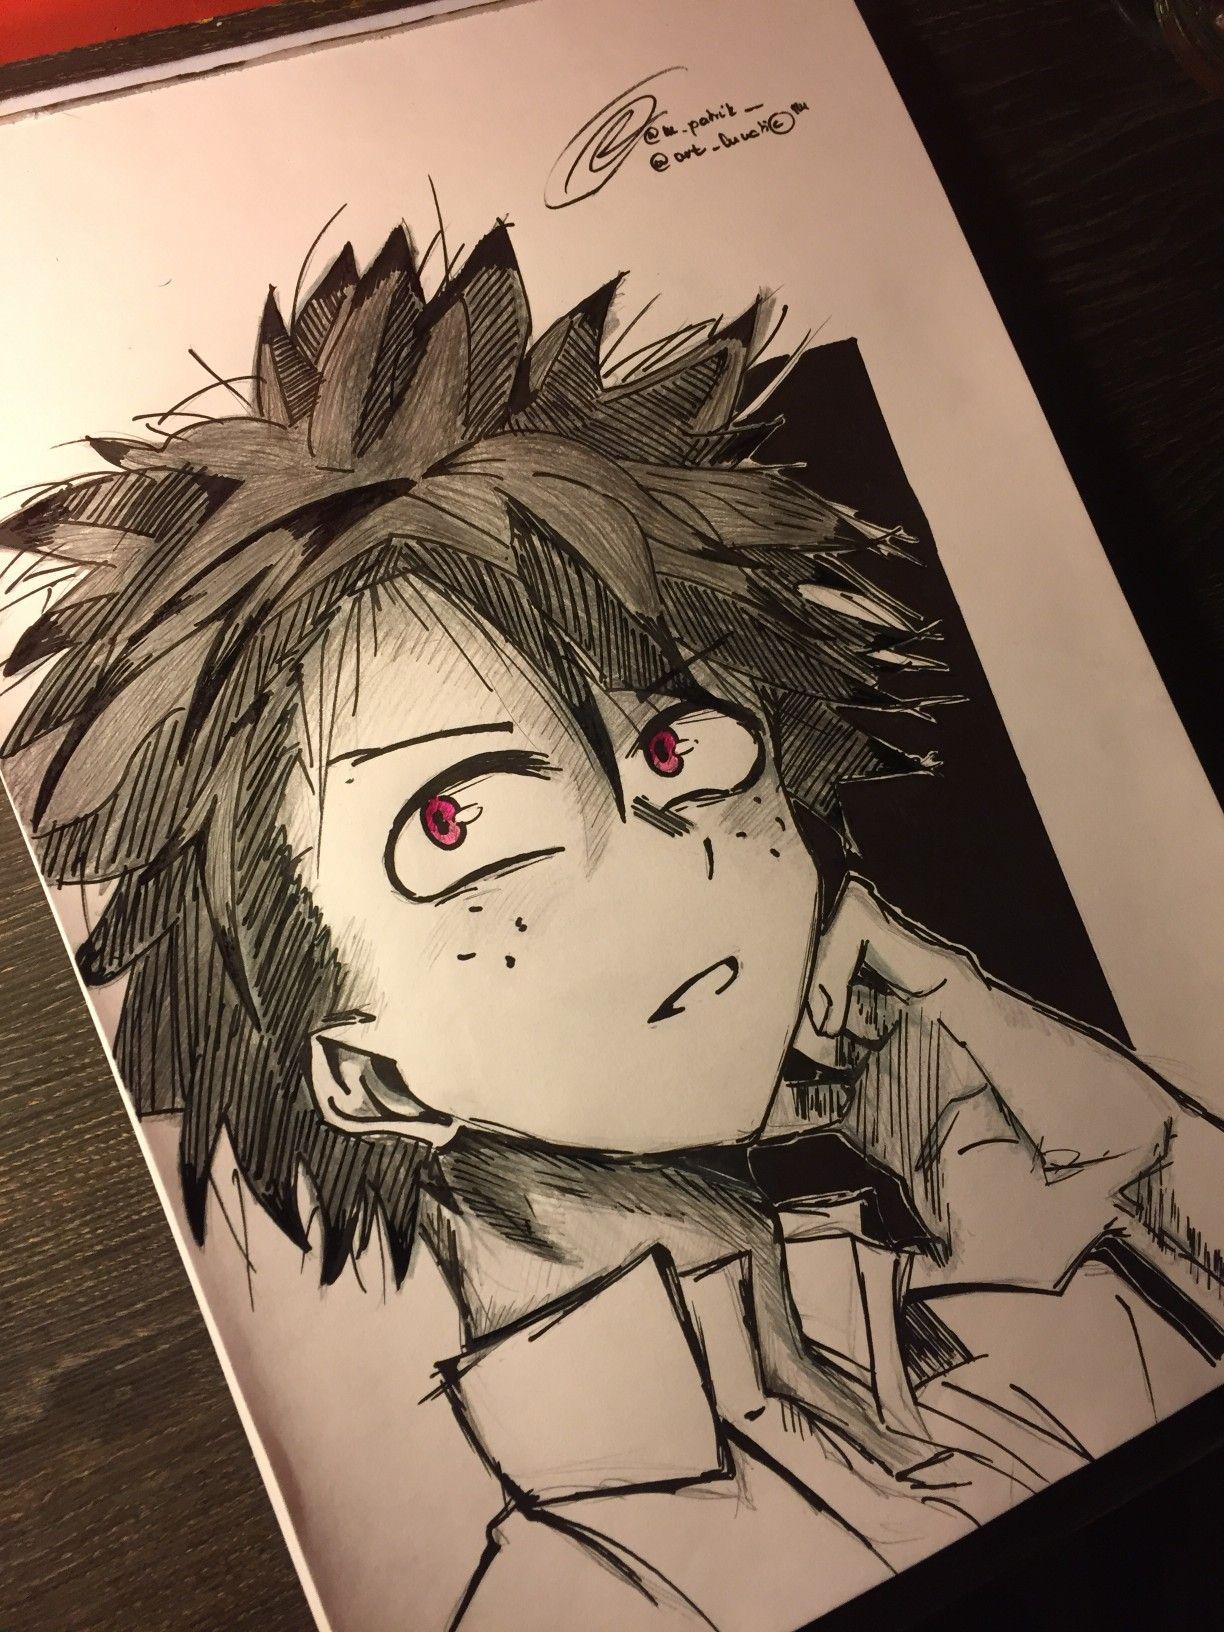 My Hero Academia Bnha Villain Izuku Midoriya Deku My Hero Academia My Hero My Drawings